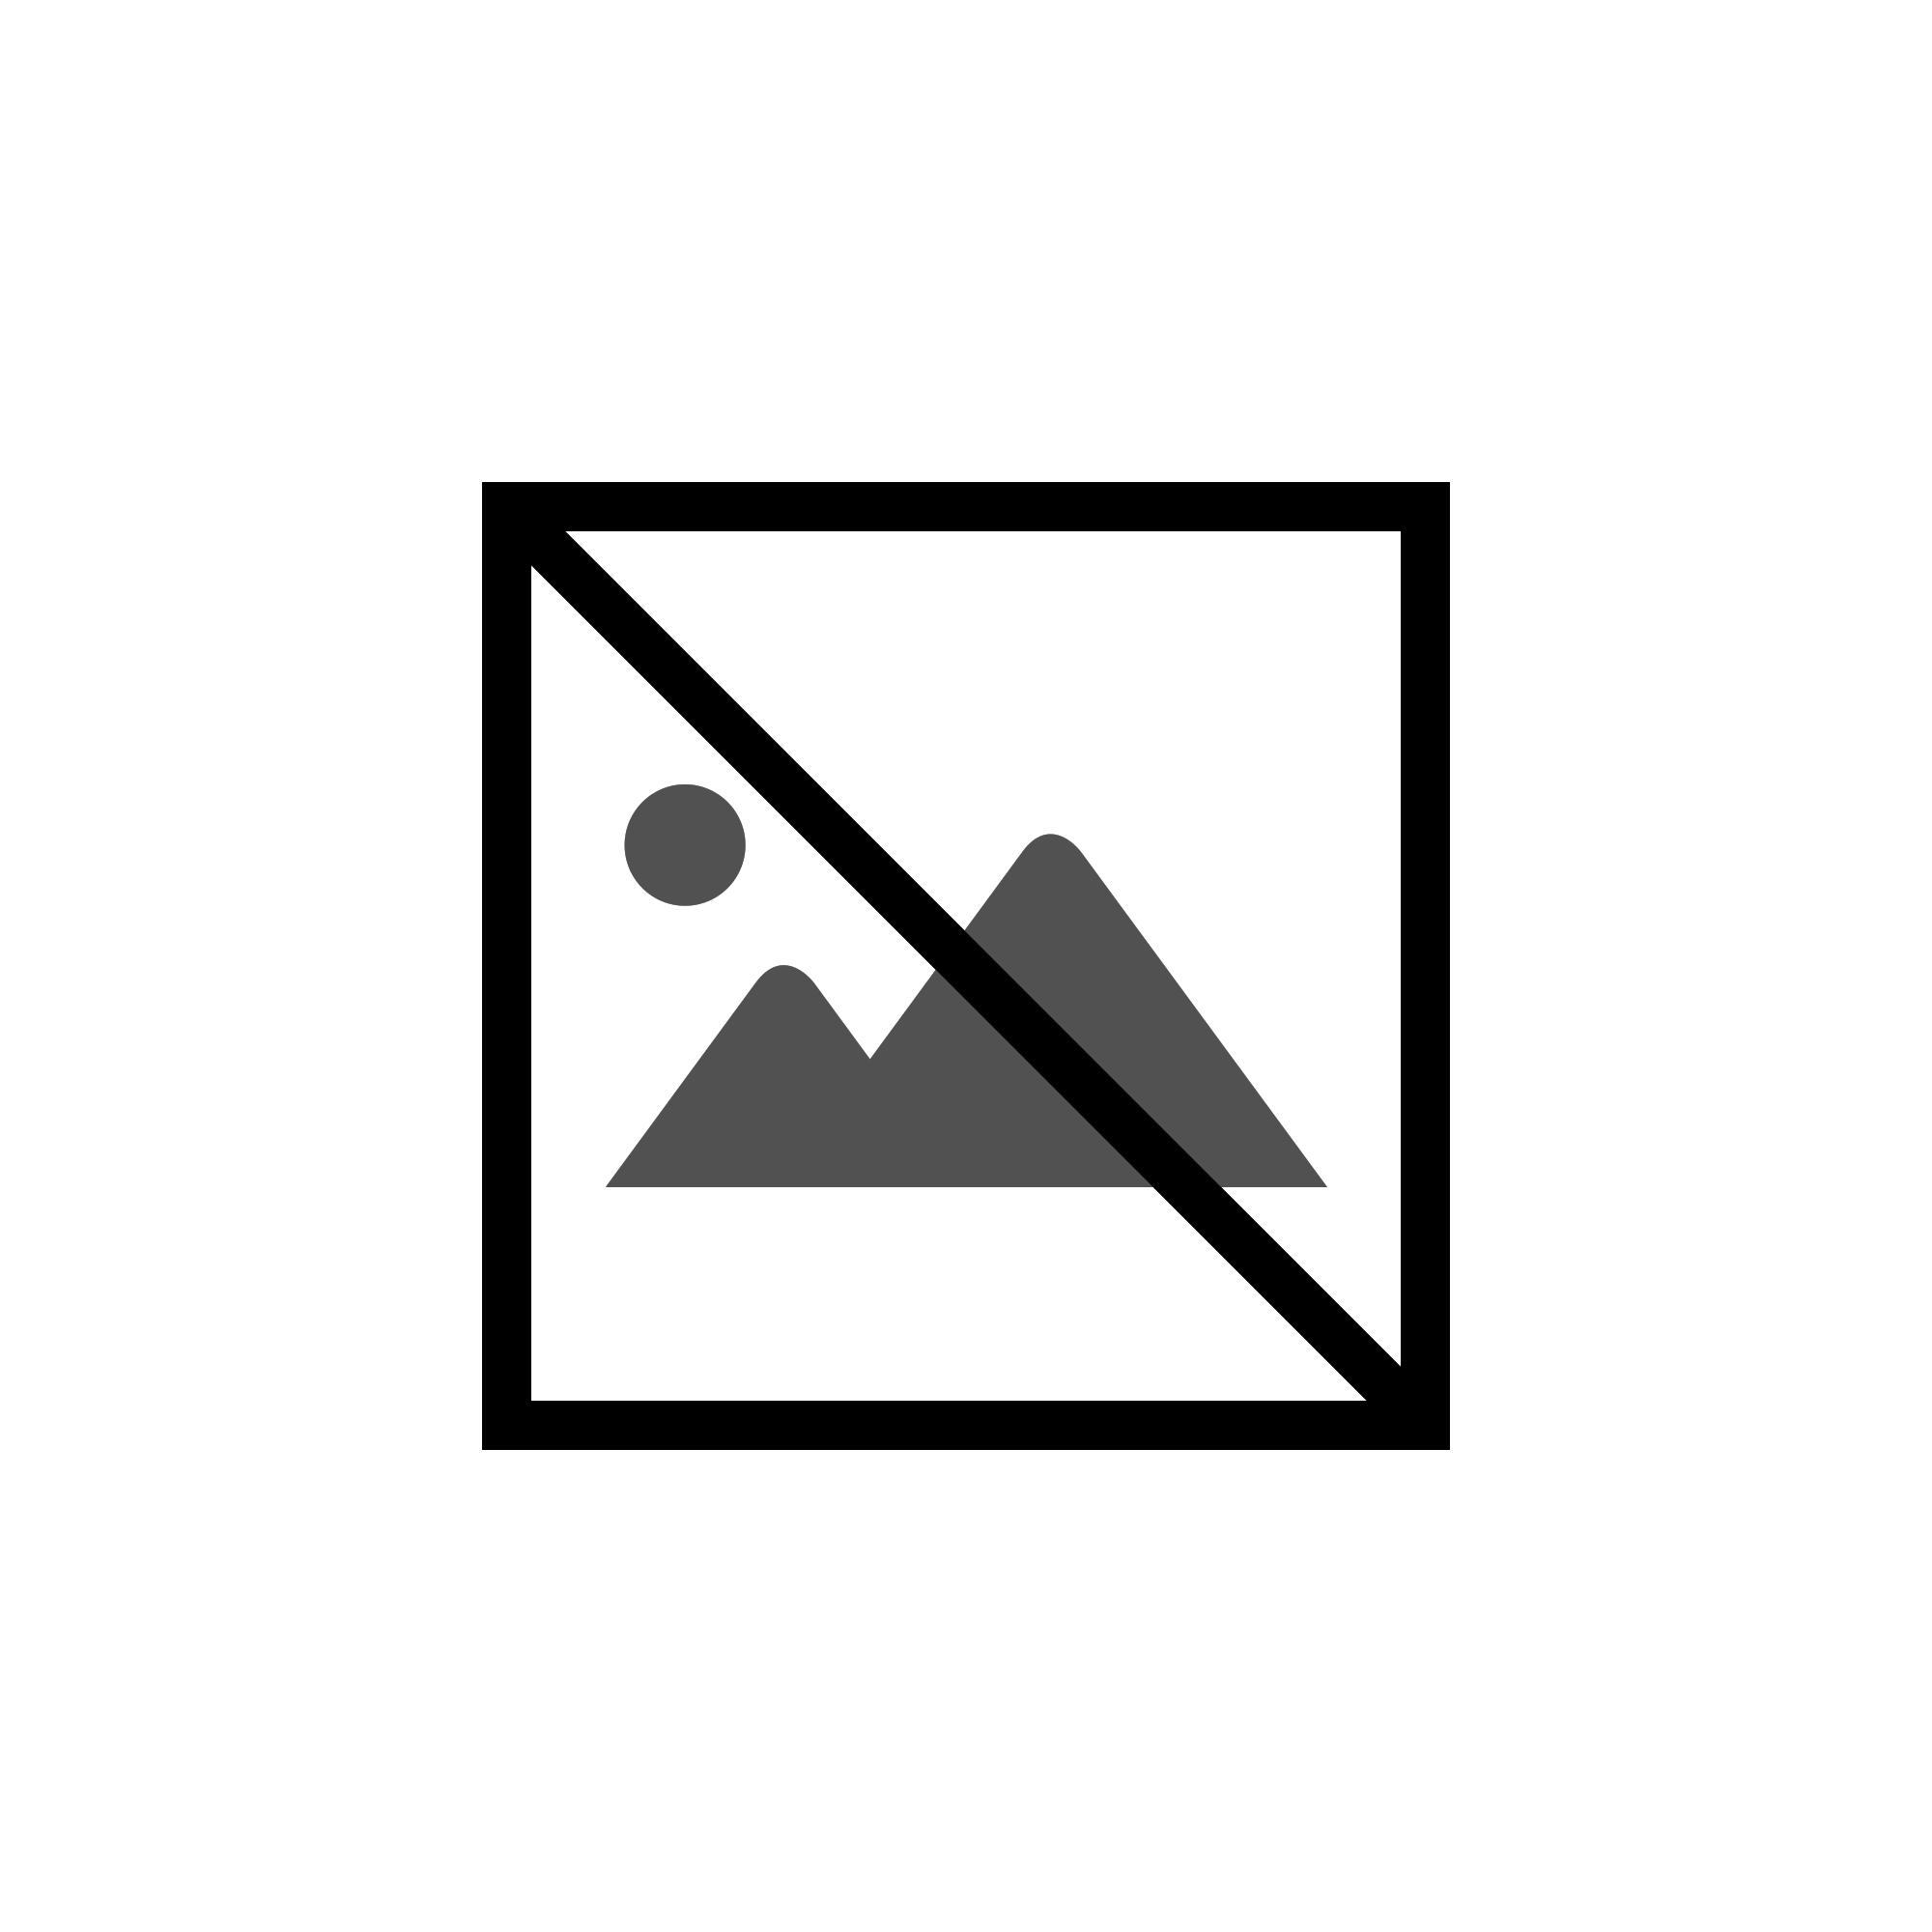 Olhanense,Golo, Cauê, 53m, 2-2